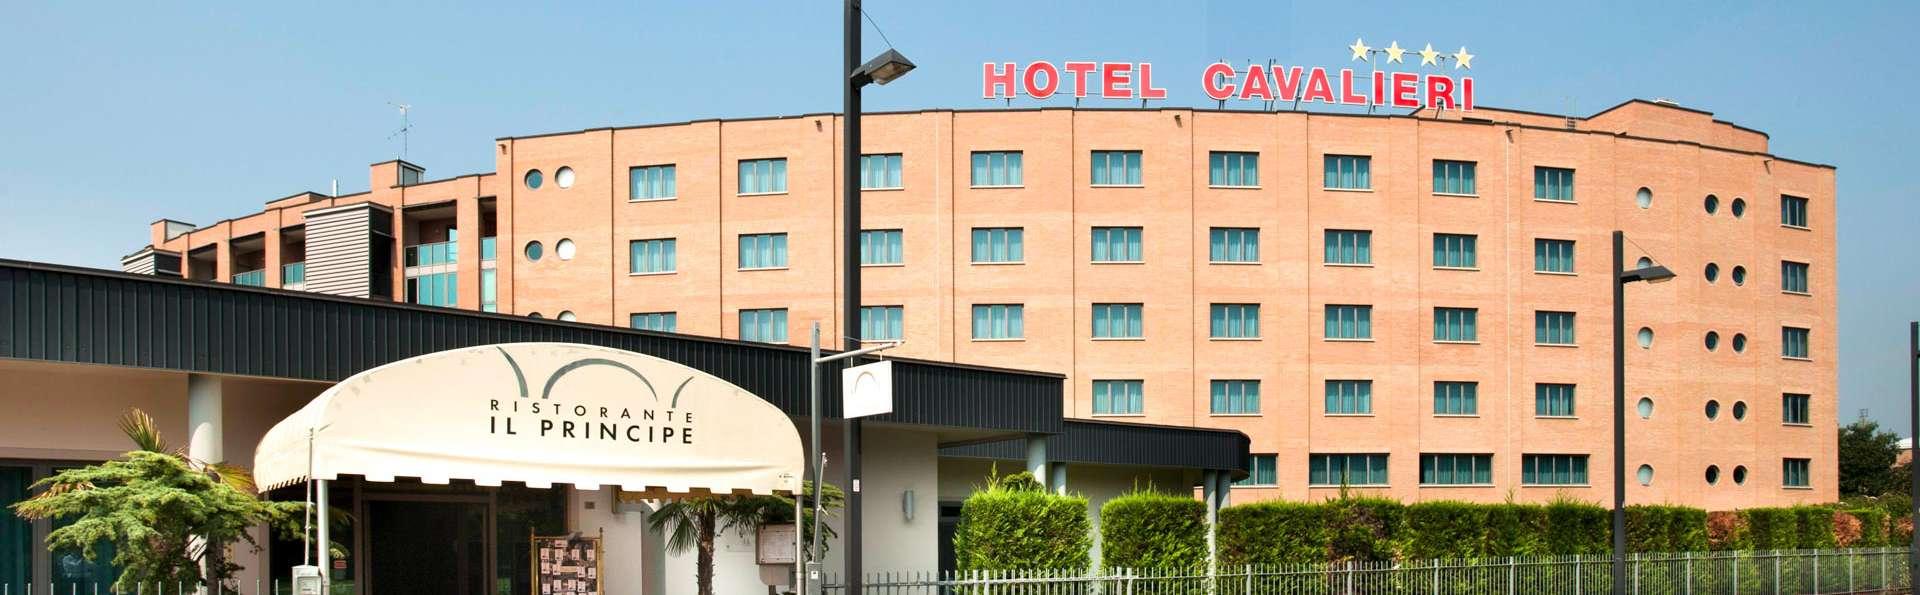 Hotel Cavalieri - EDIT_FRONT_01.jpg